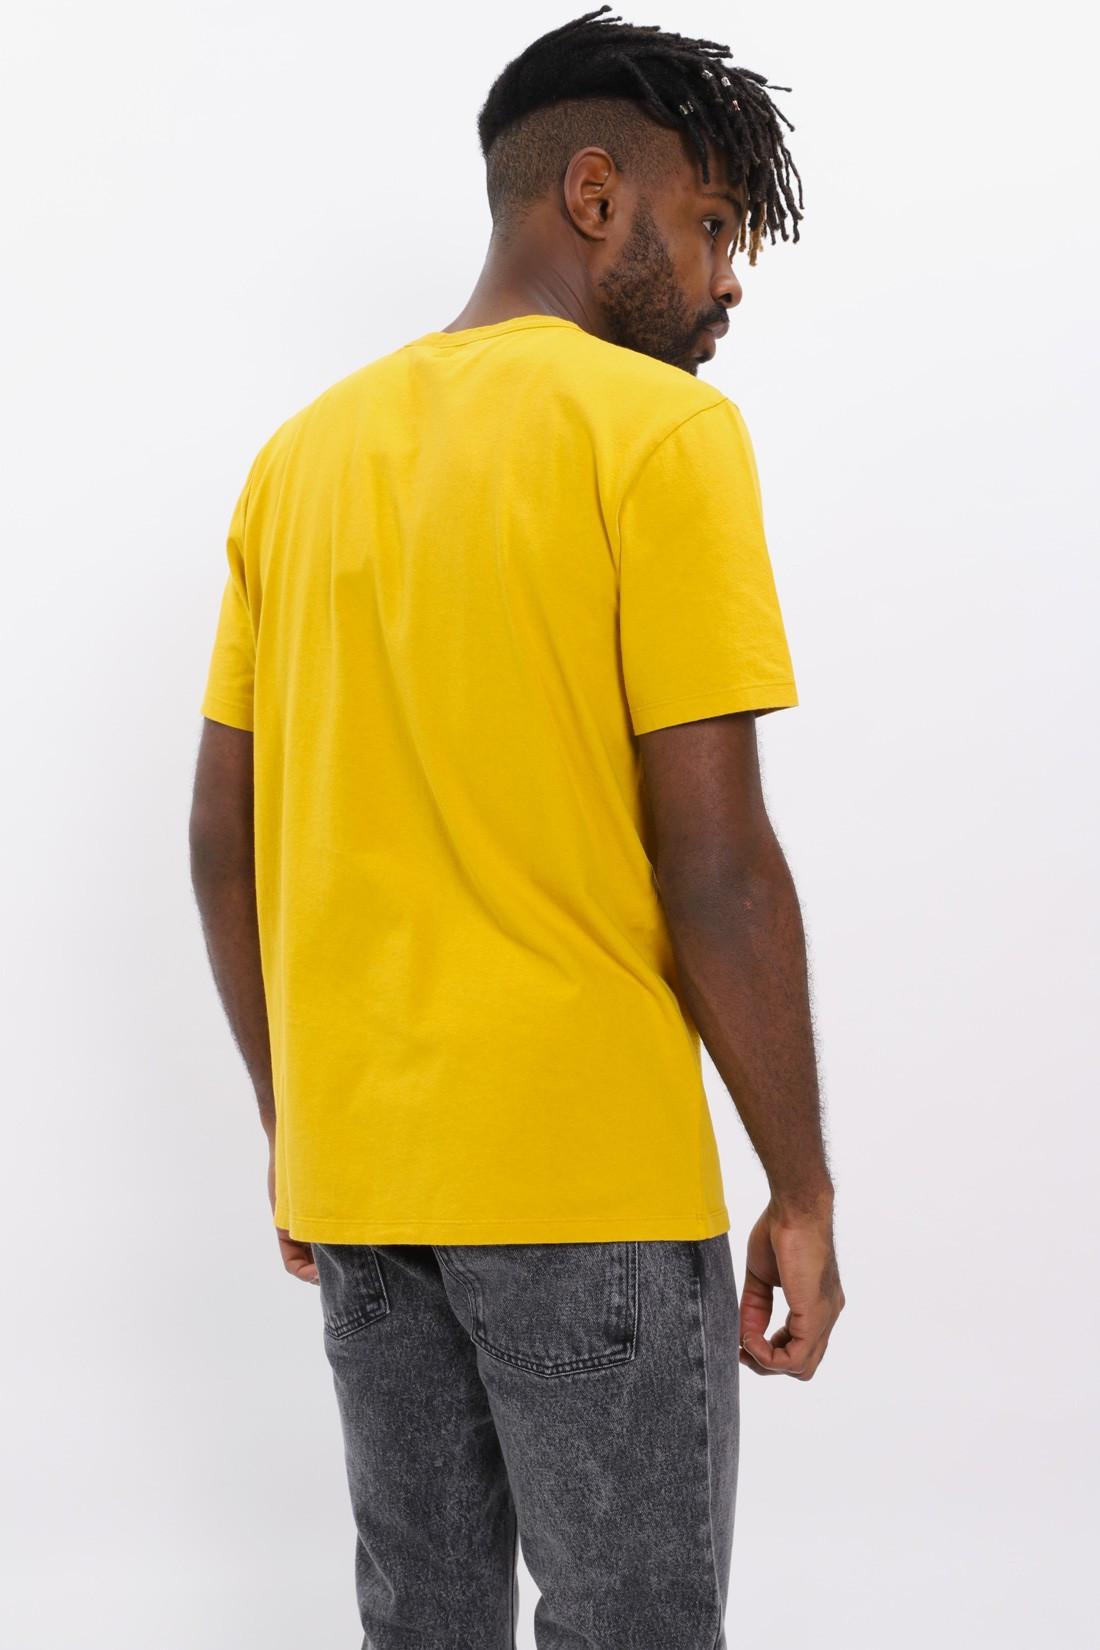 AMI / Tee-shirt ami coeur Jaune